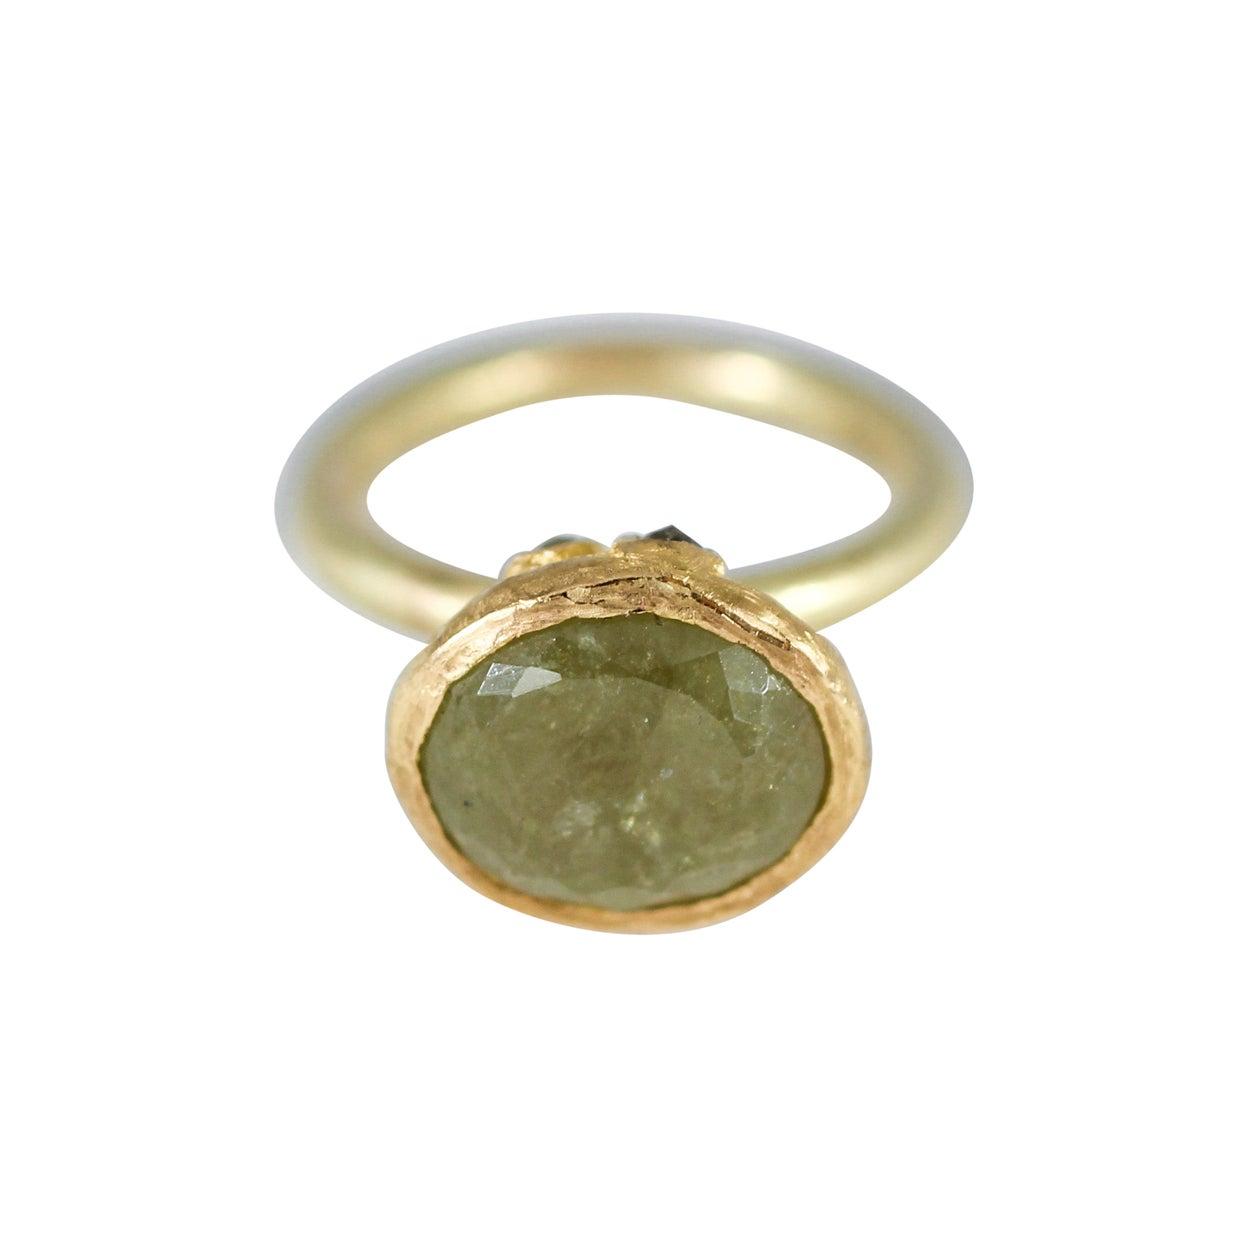 9ct Russian Demantoid Garnet Solitaire Yellow Diamonds 22k Gold Cocktail Ring